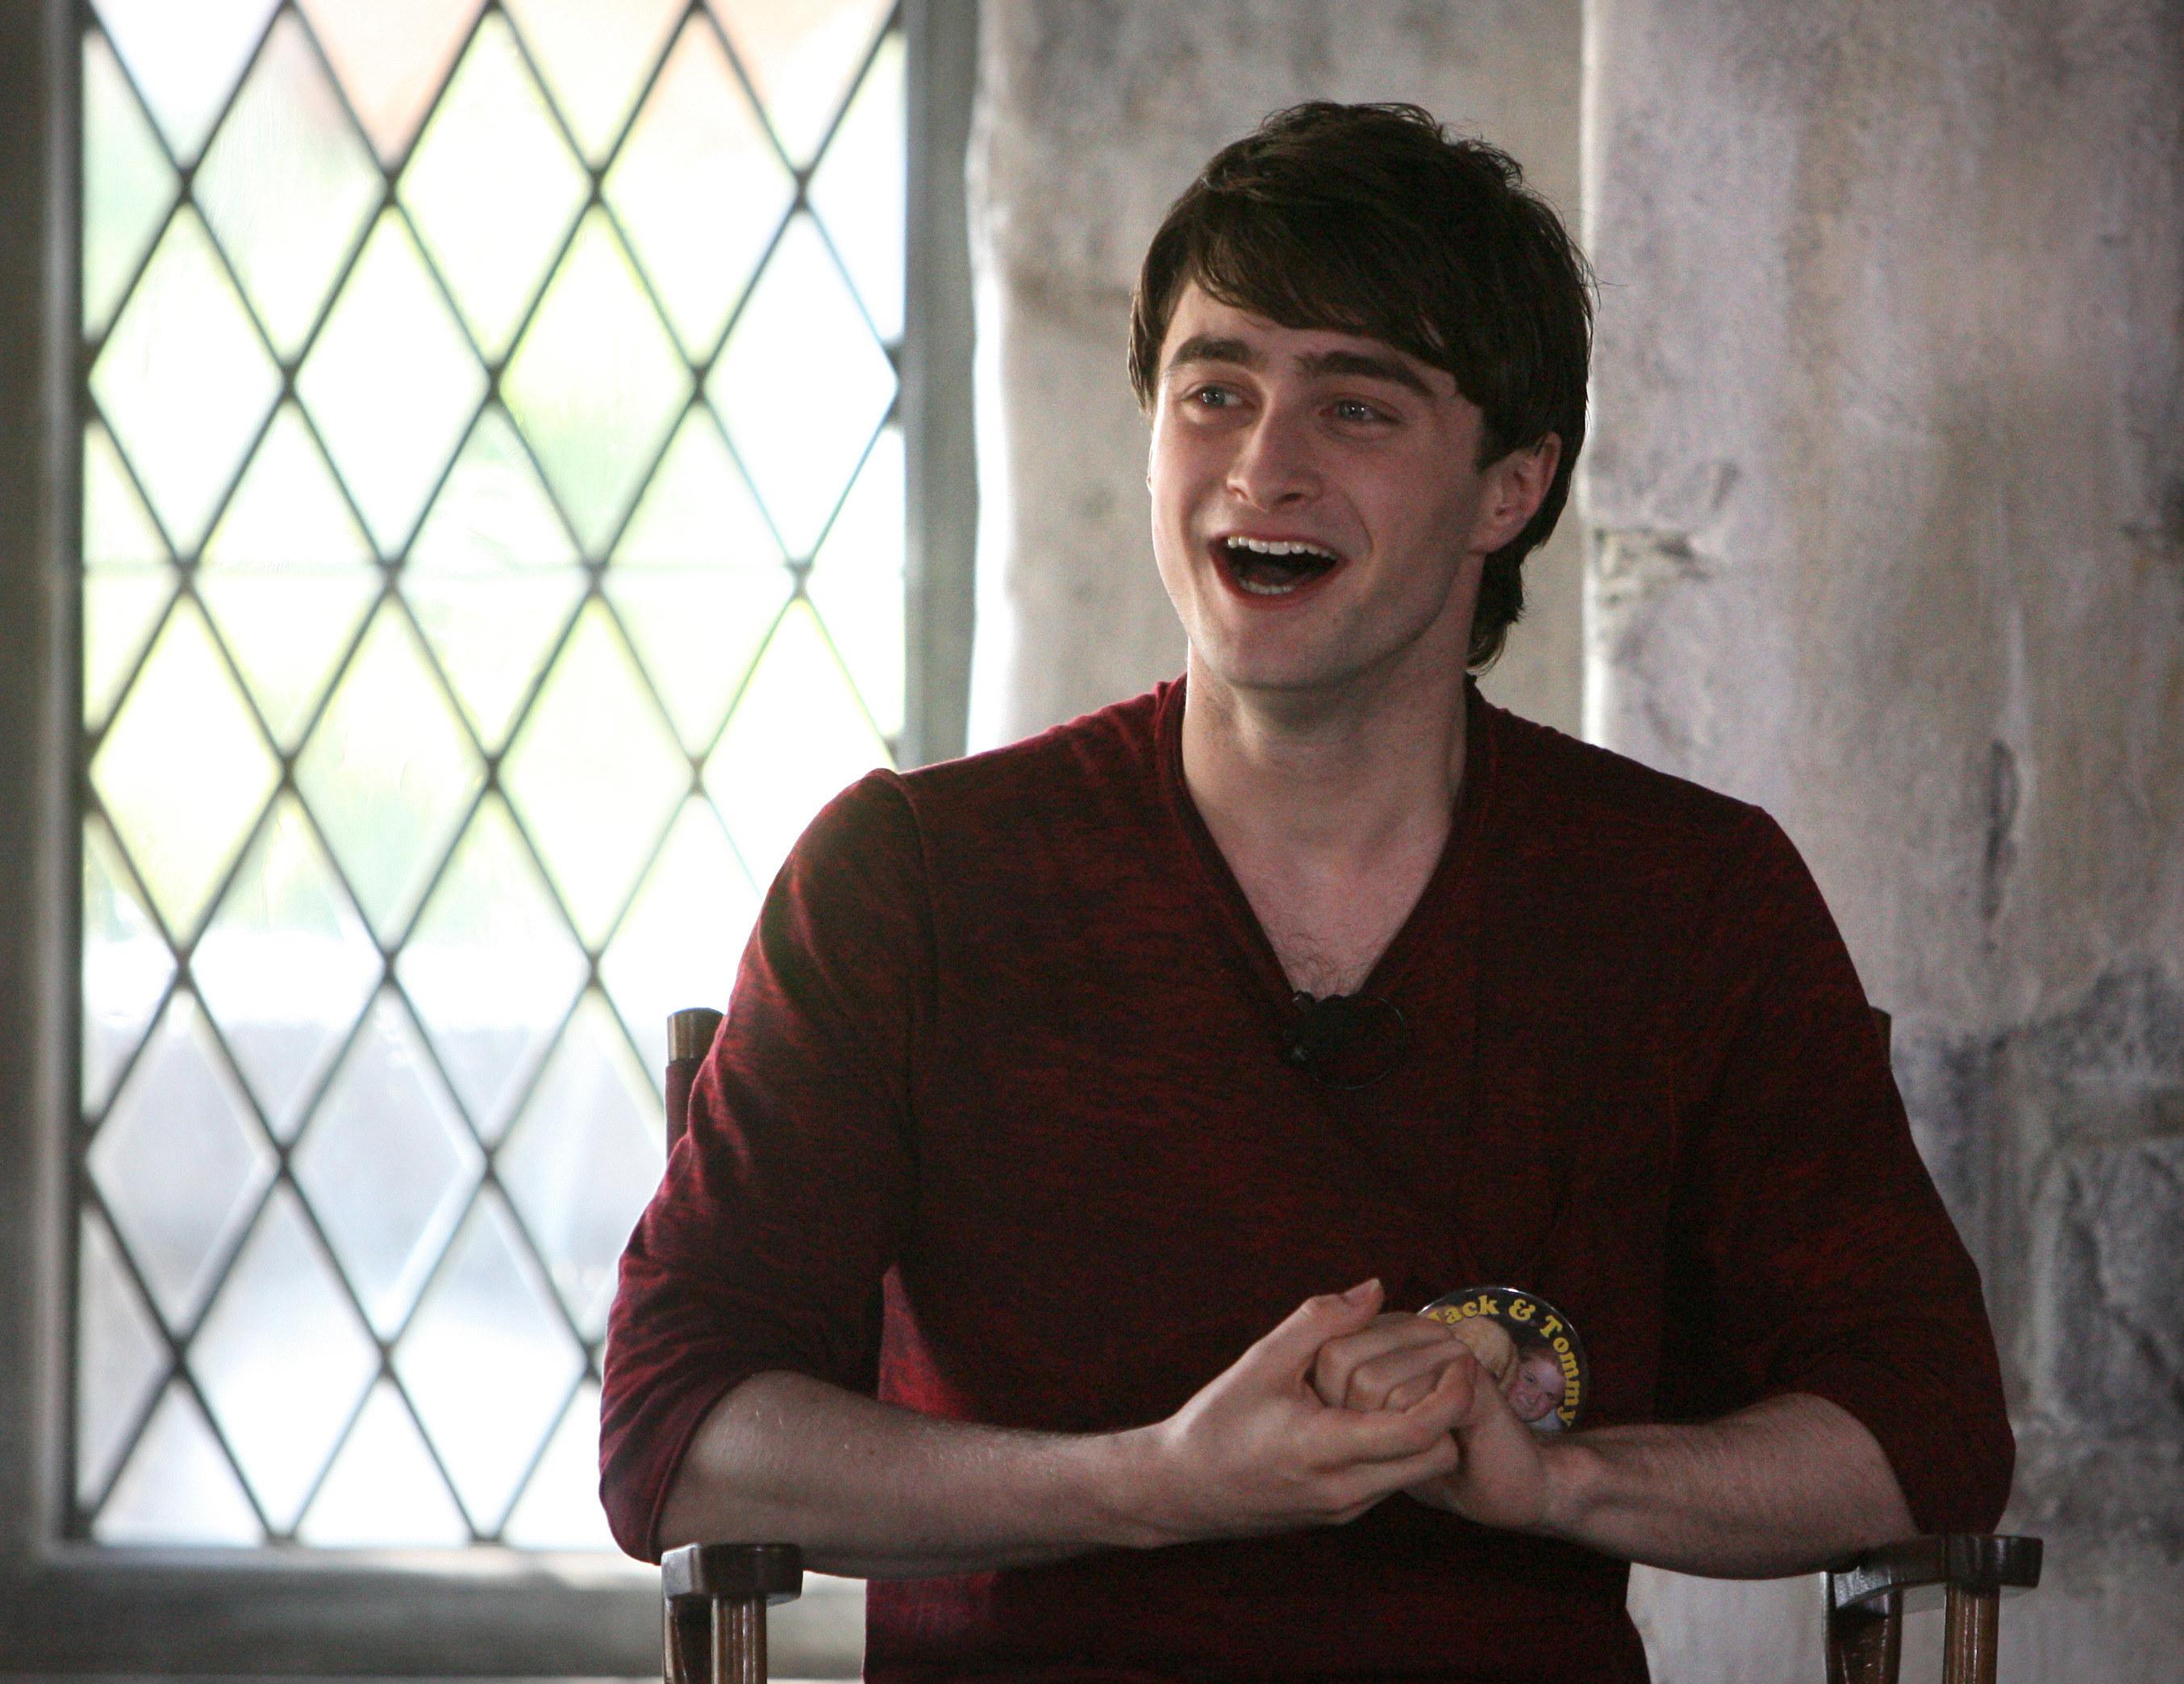 Actor Daniel Radcliffe smiling